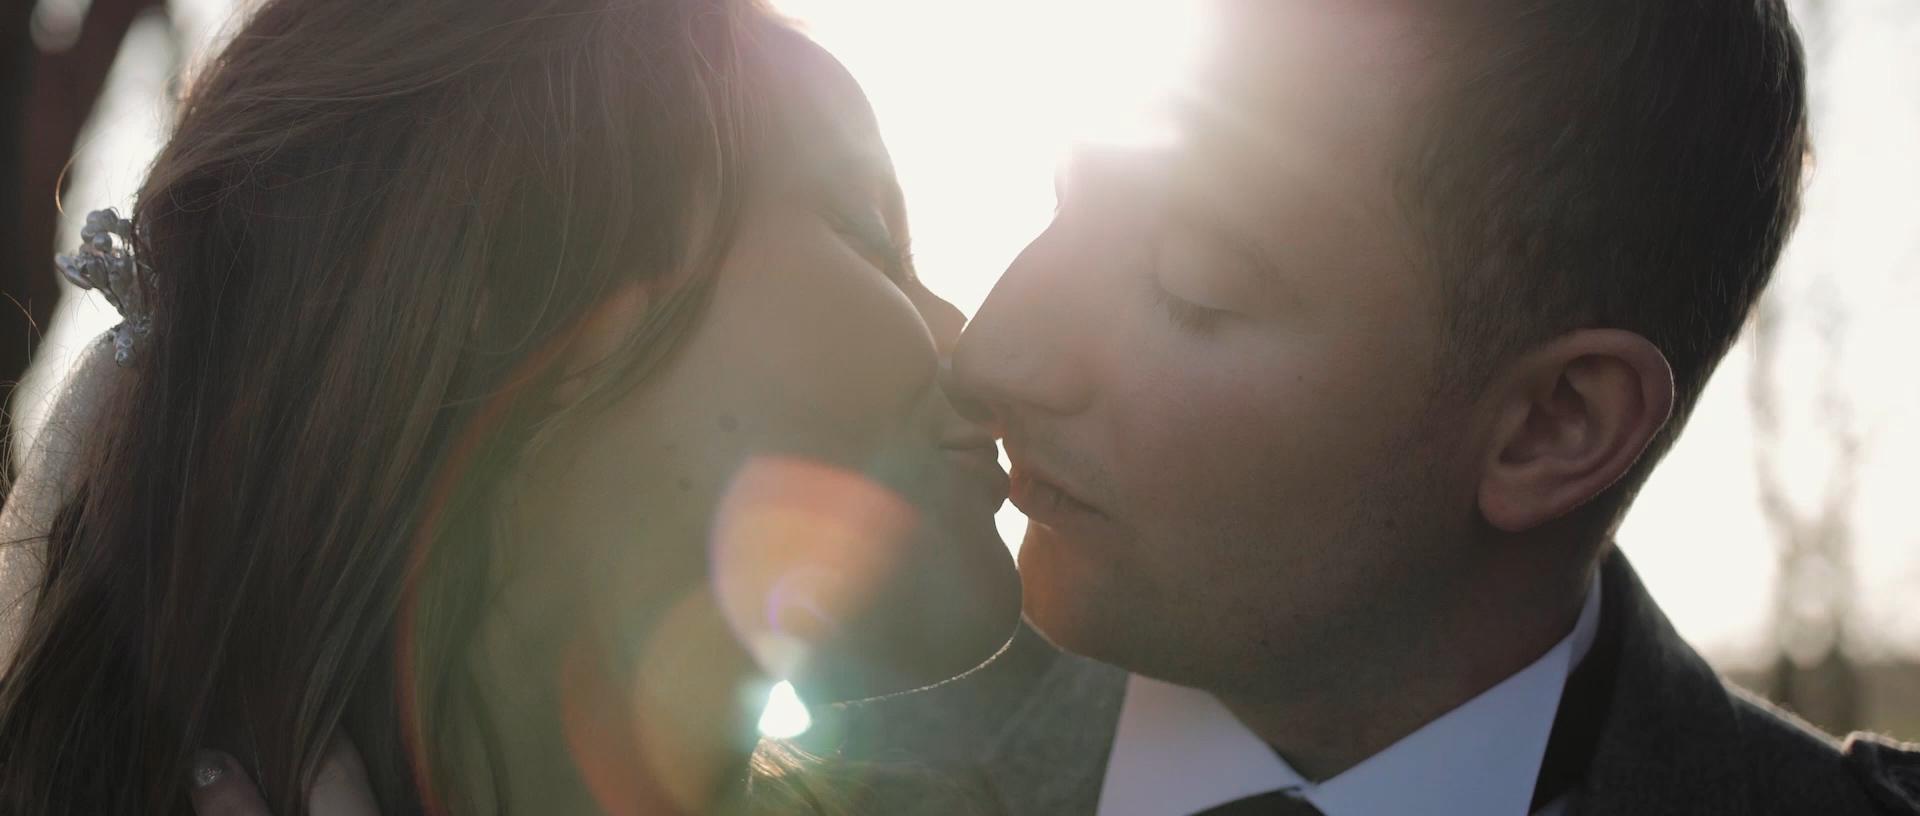 ayr-wedding-videographer_LL_03.jpg